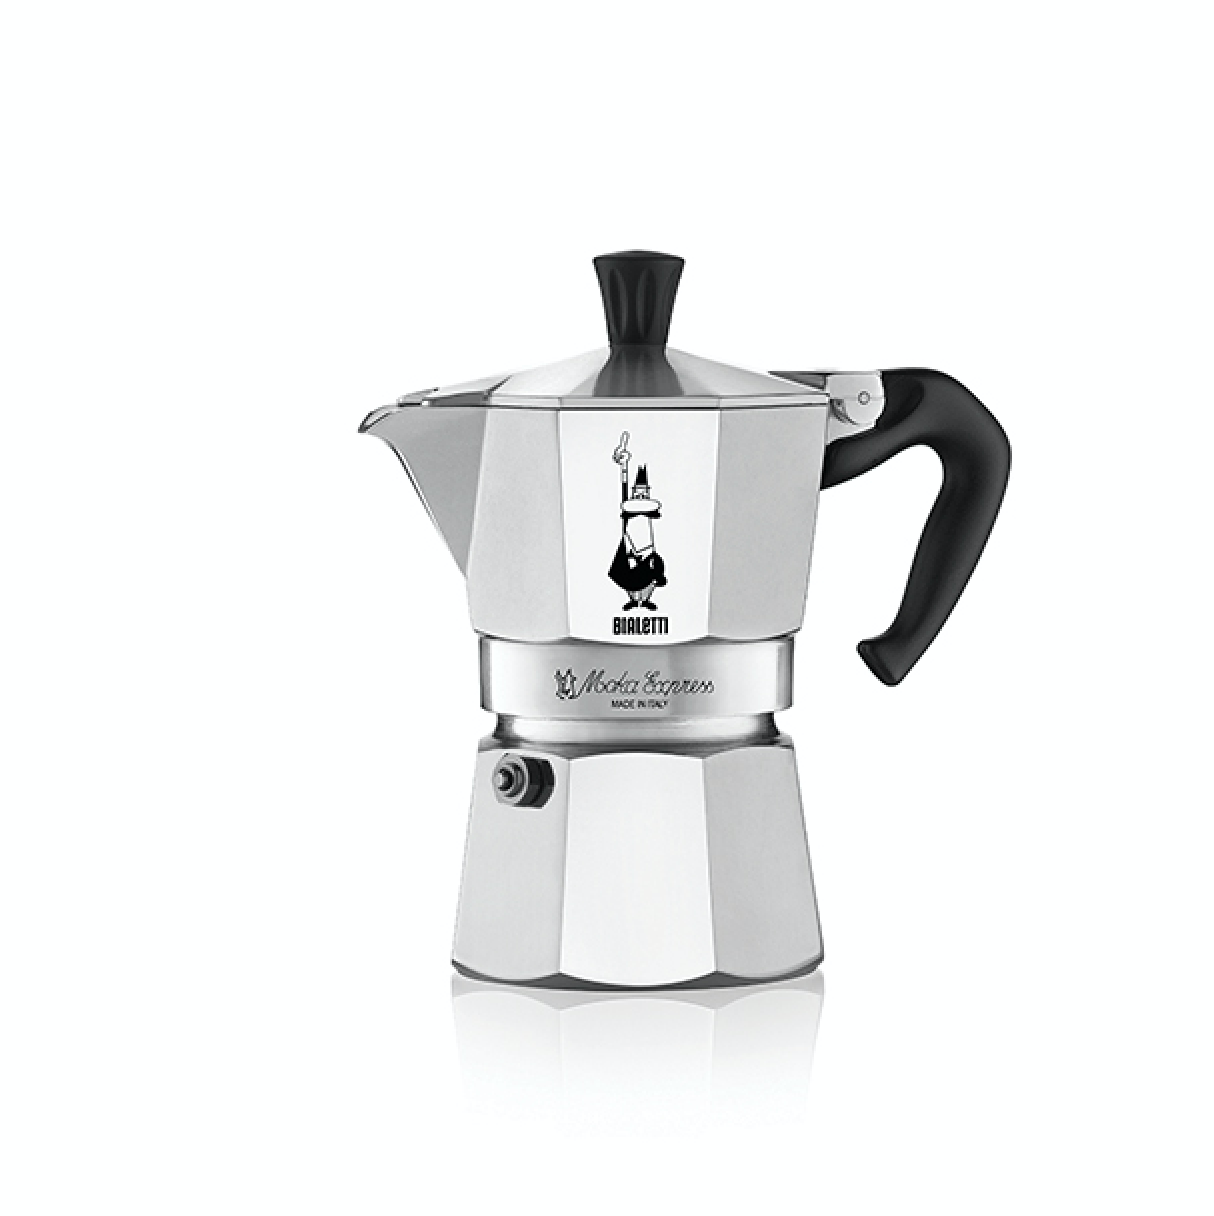 Bialetti 比乐蒂 0001162/AP 手冲咖啡壶 120ml